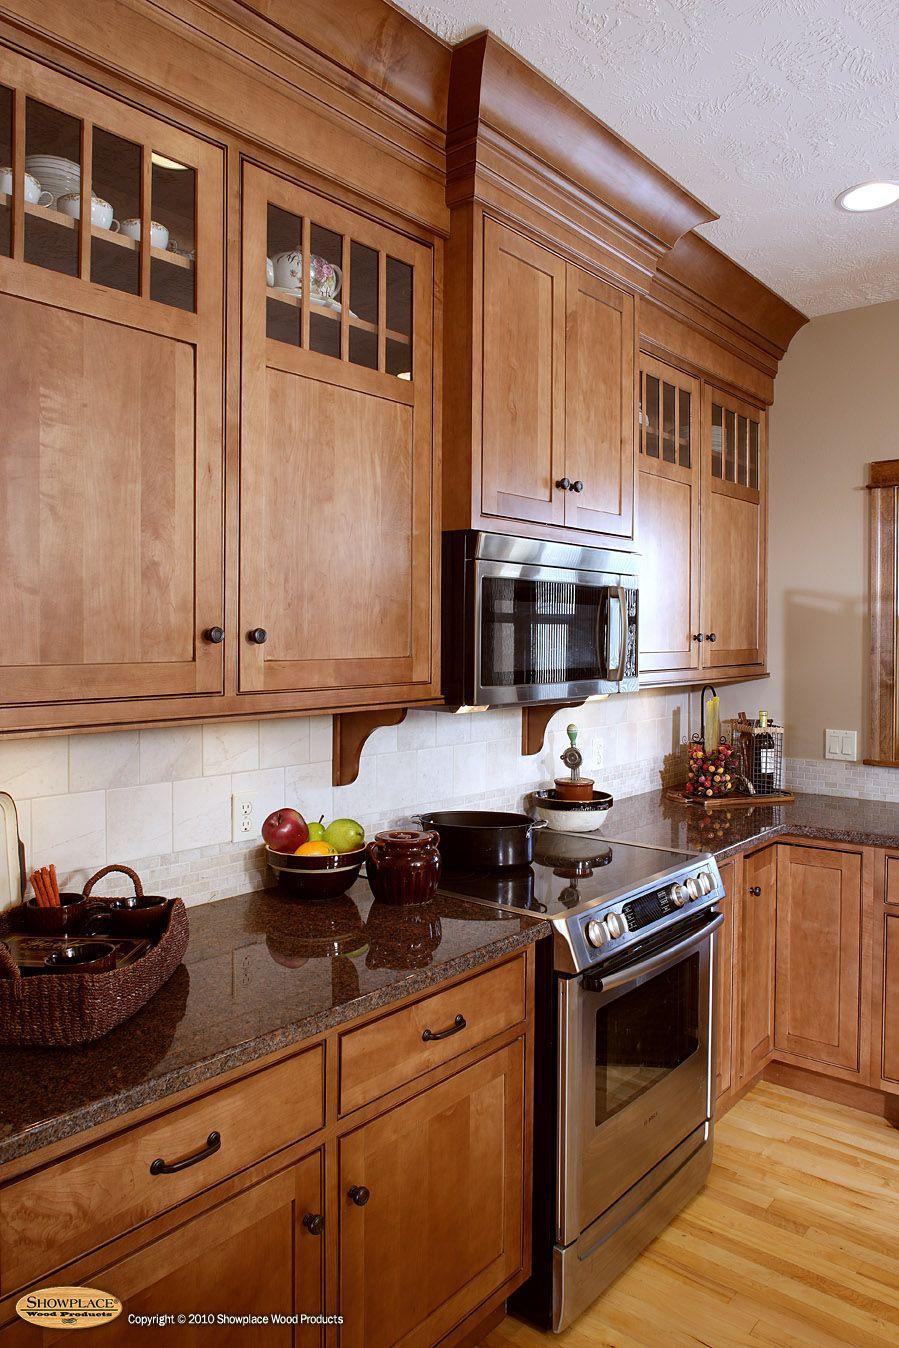 Showplacewood Com Door Style Pendleton Inset Species Maple Finish Nutmeg With Walnut Glaze Isl Kitchen Inspirations Kitchen Renovation Kitchen Design